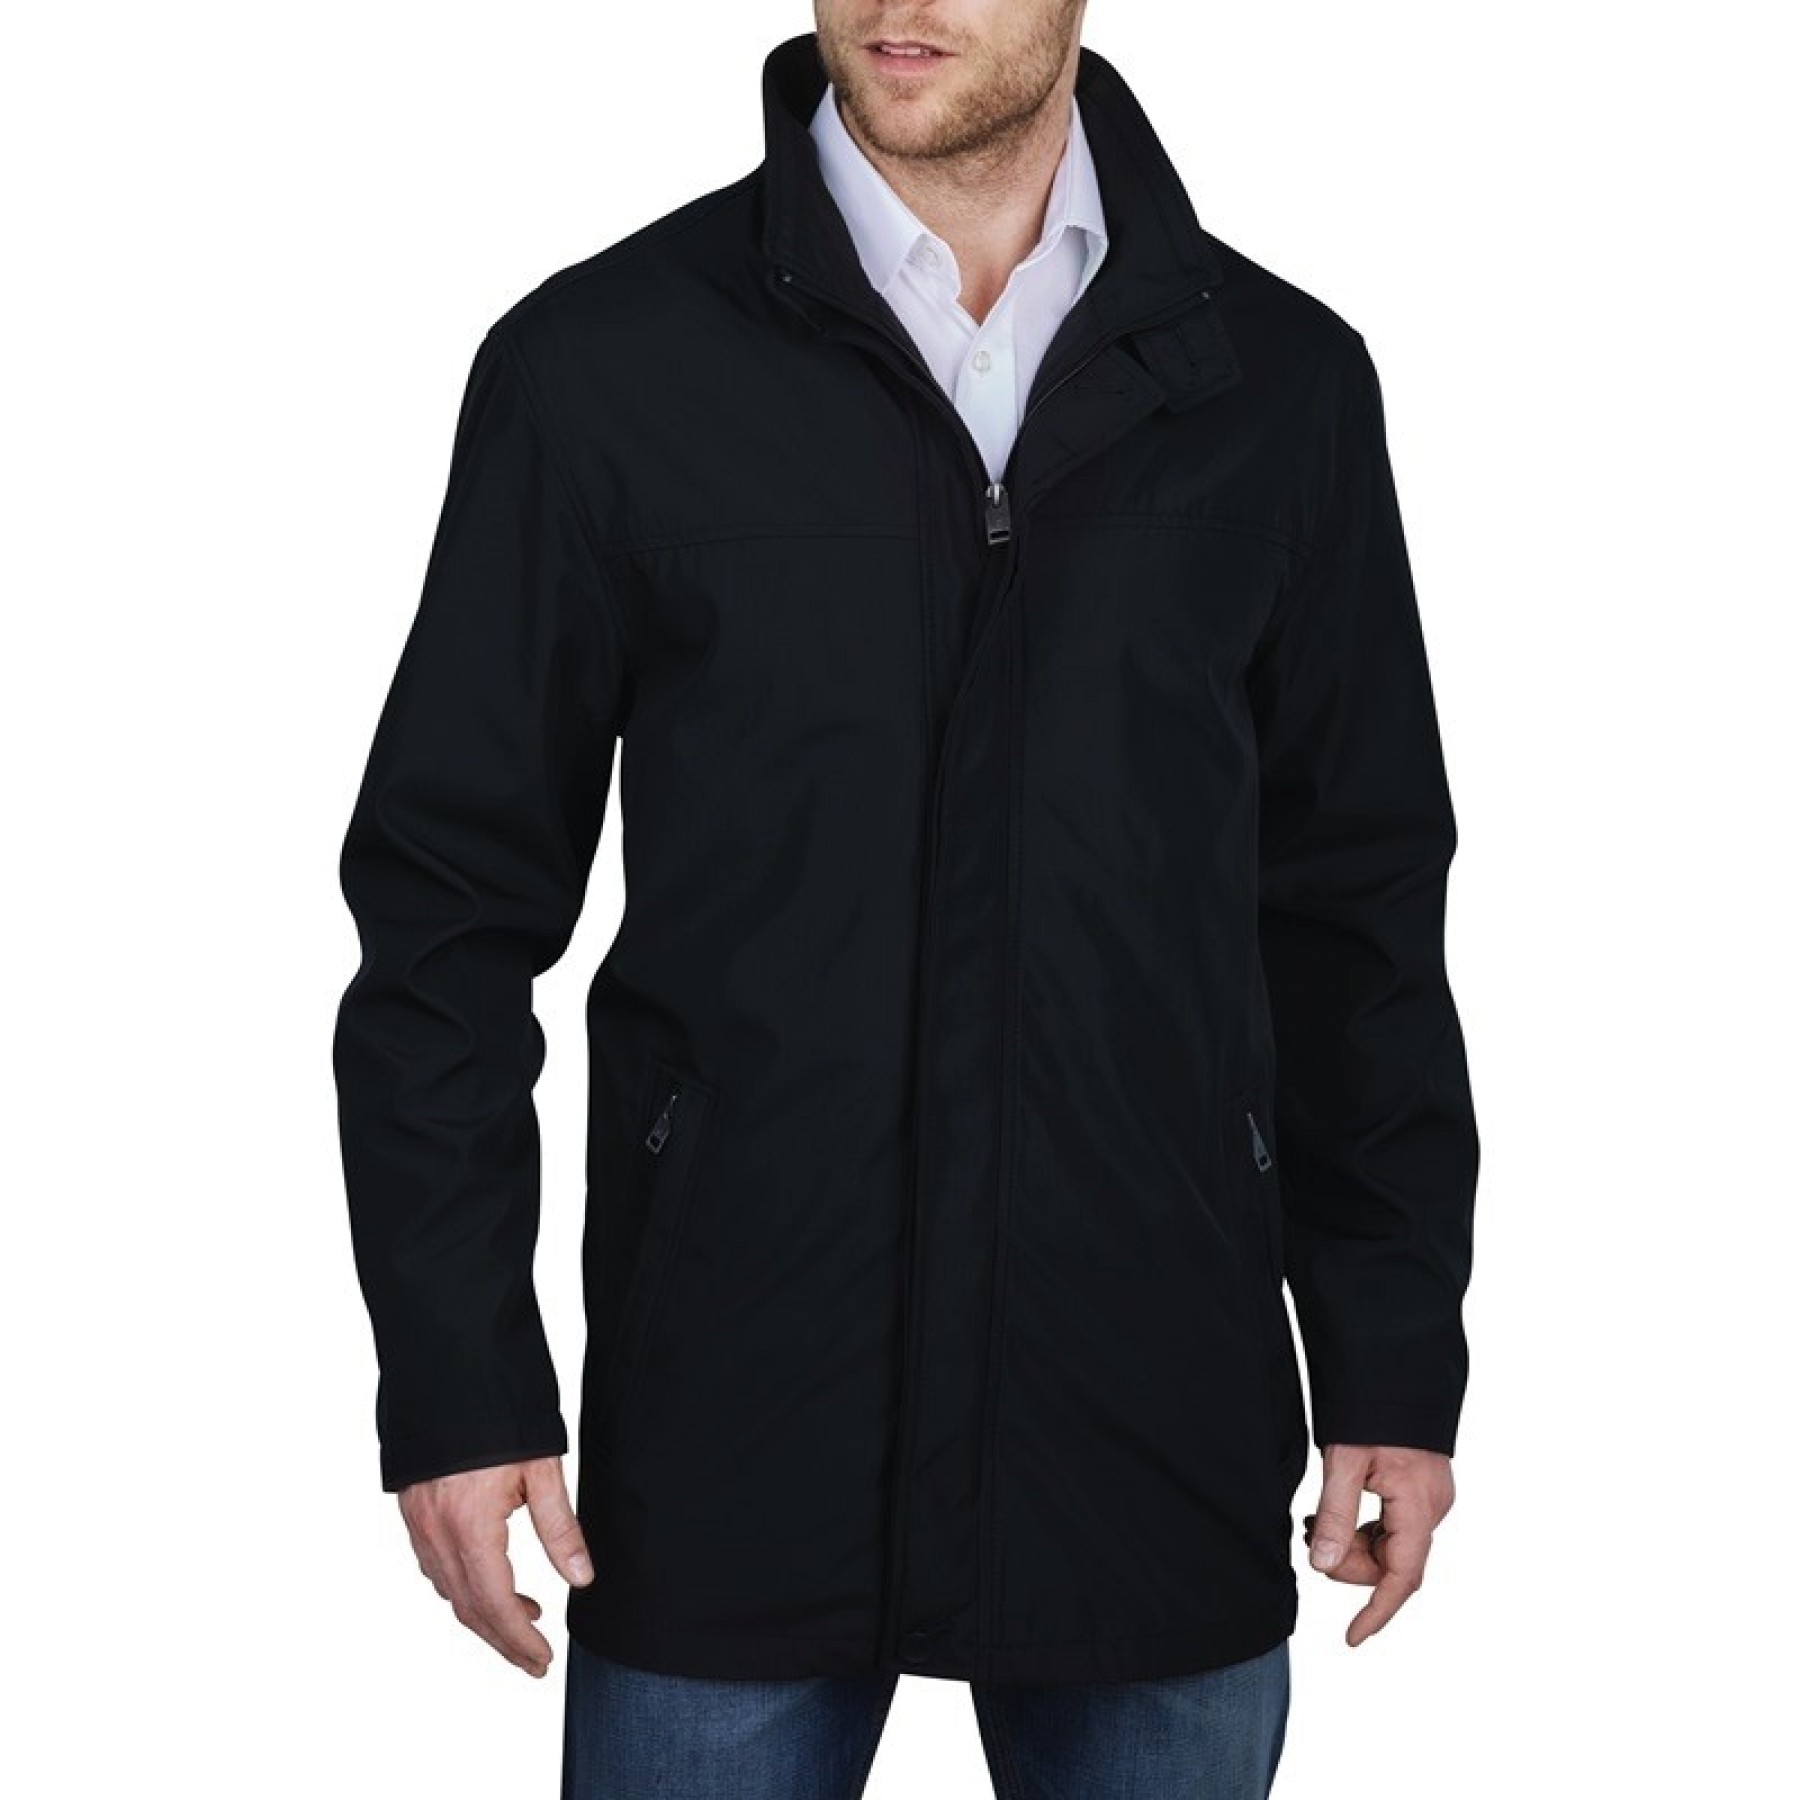 Redpoint Miesten Kevättakki, Bonded Jacket Musta